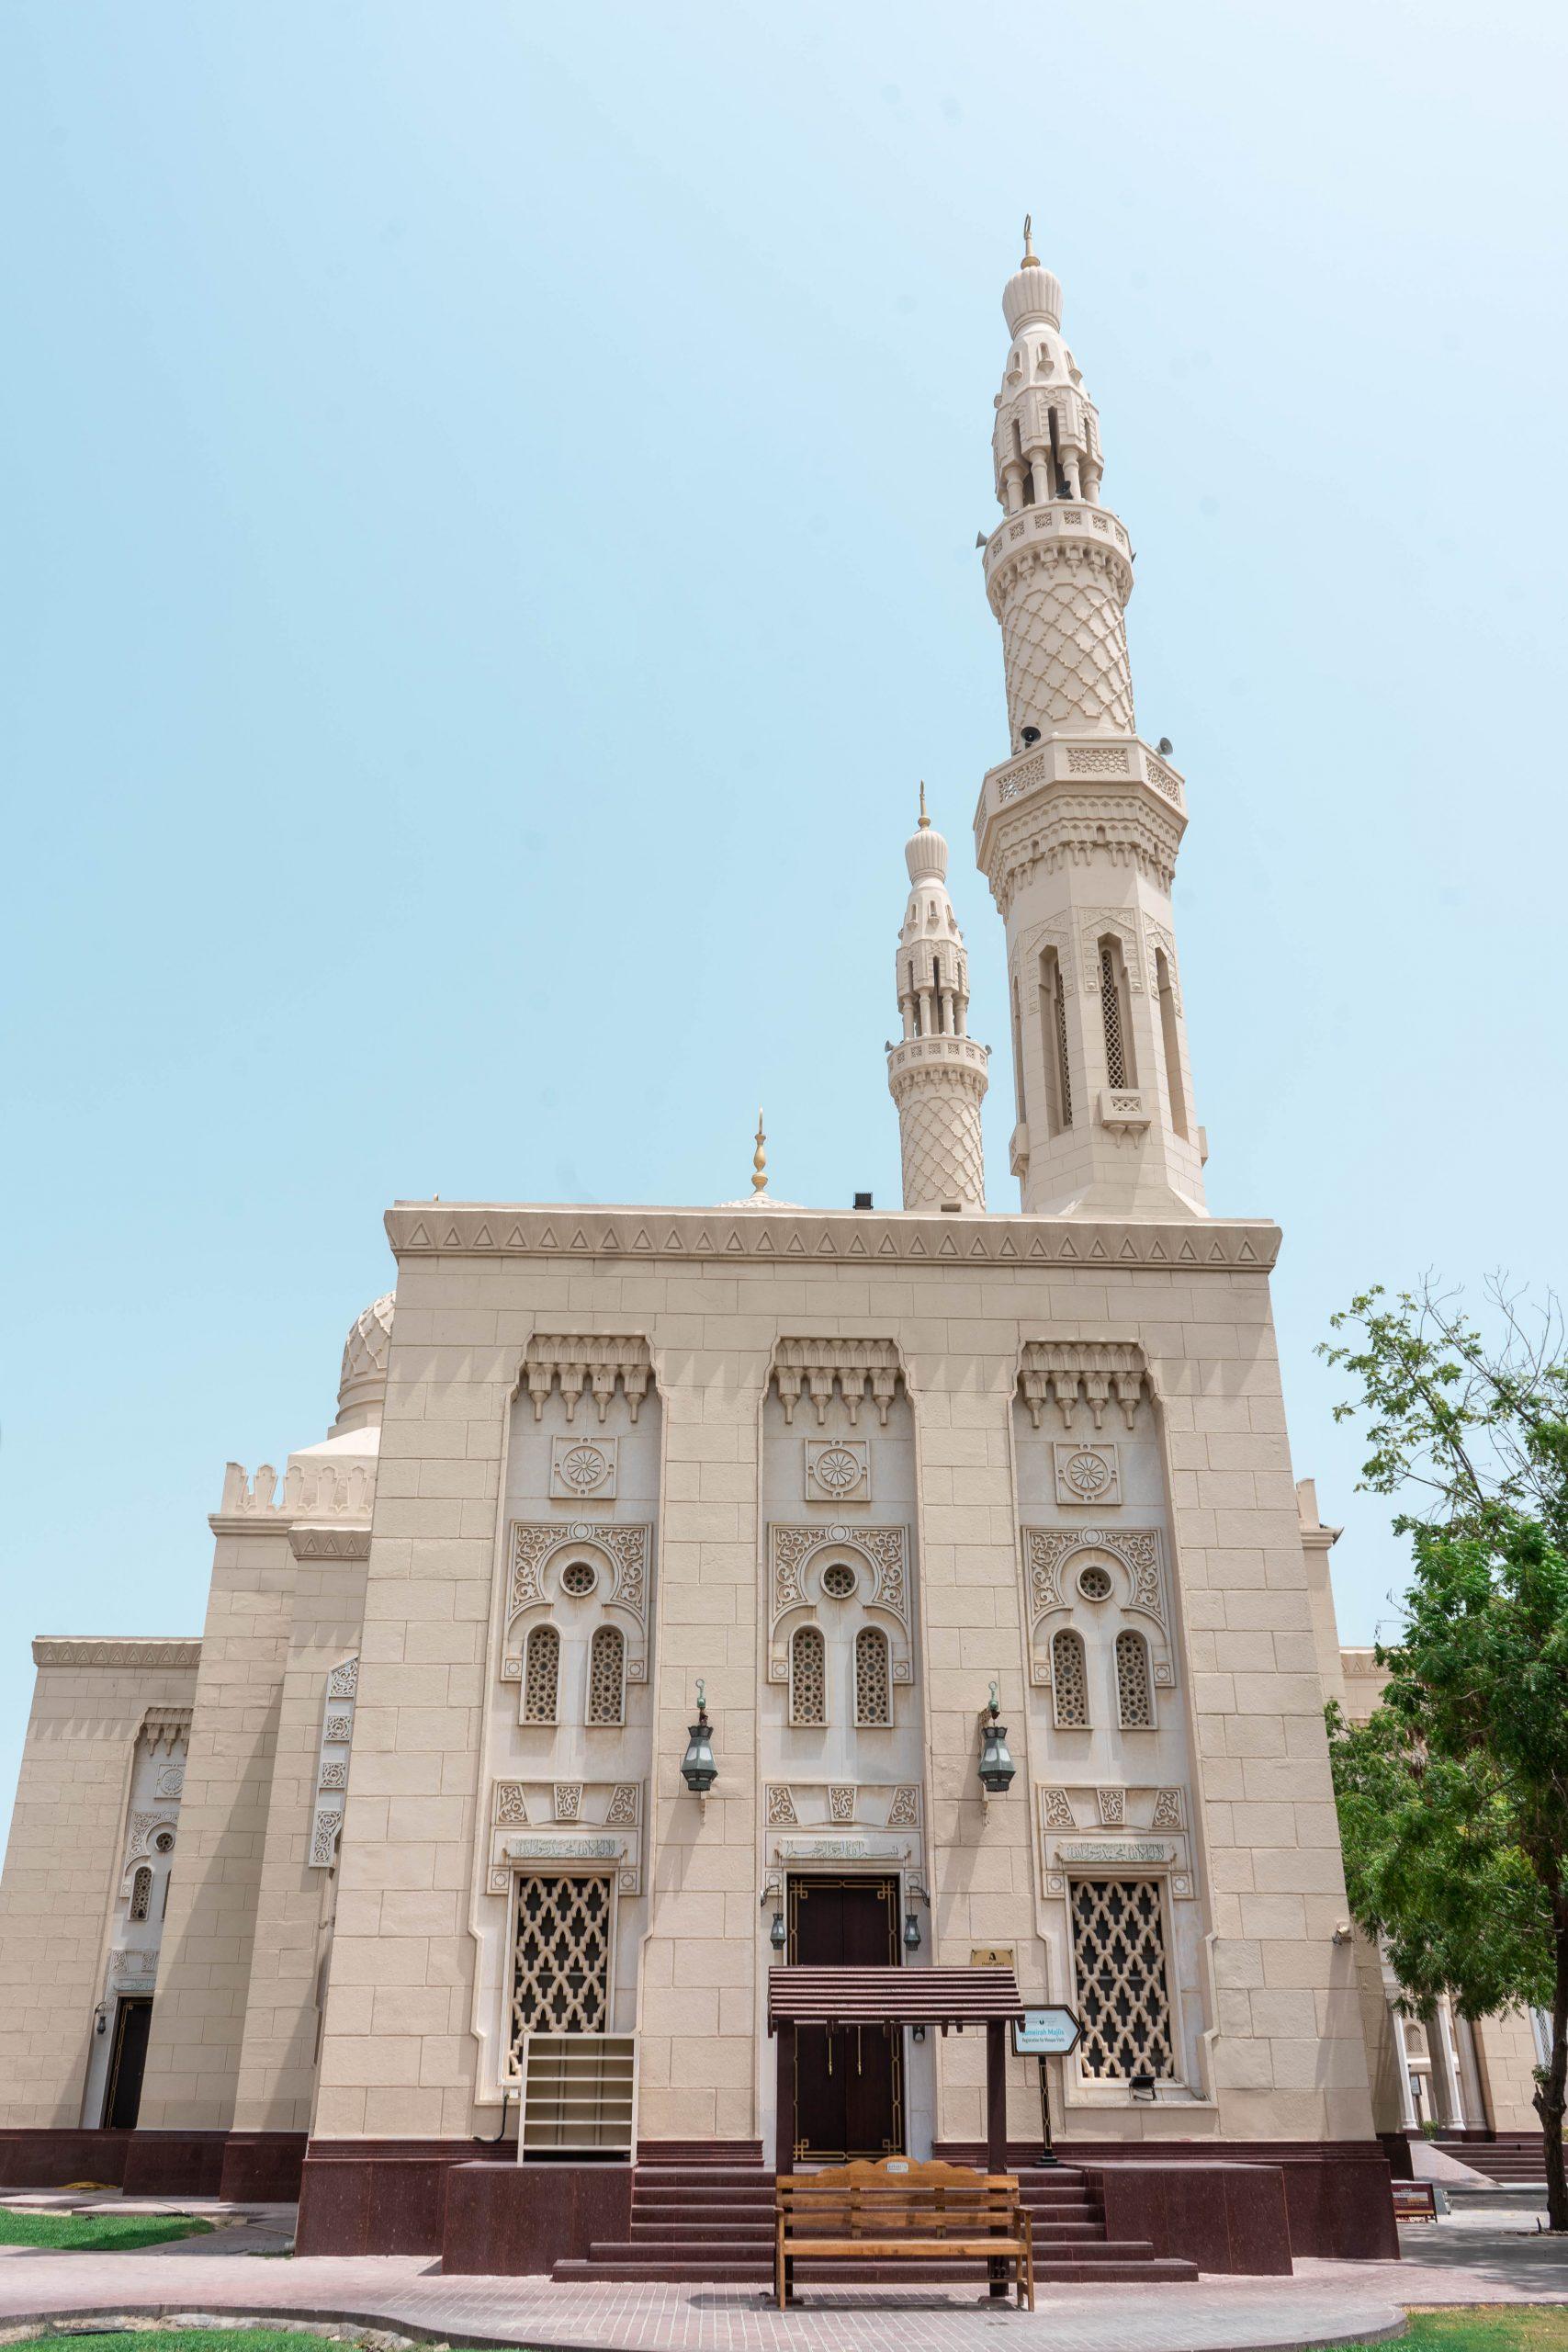 jumeirah mosque dubai united arab emriates uae sandstone building beige masjid